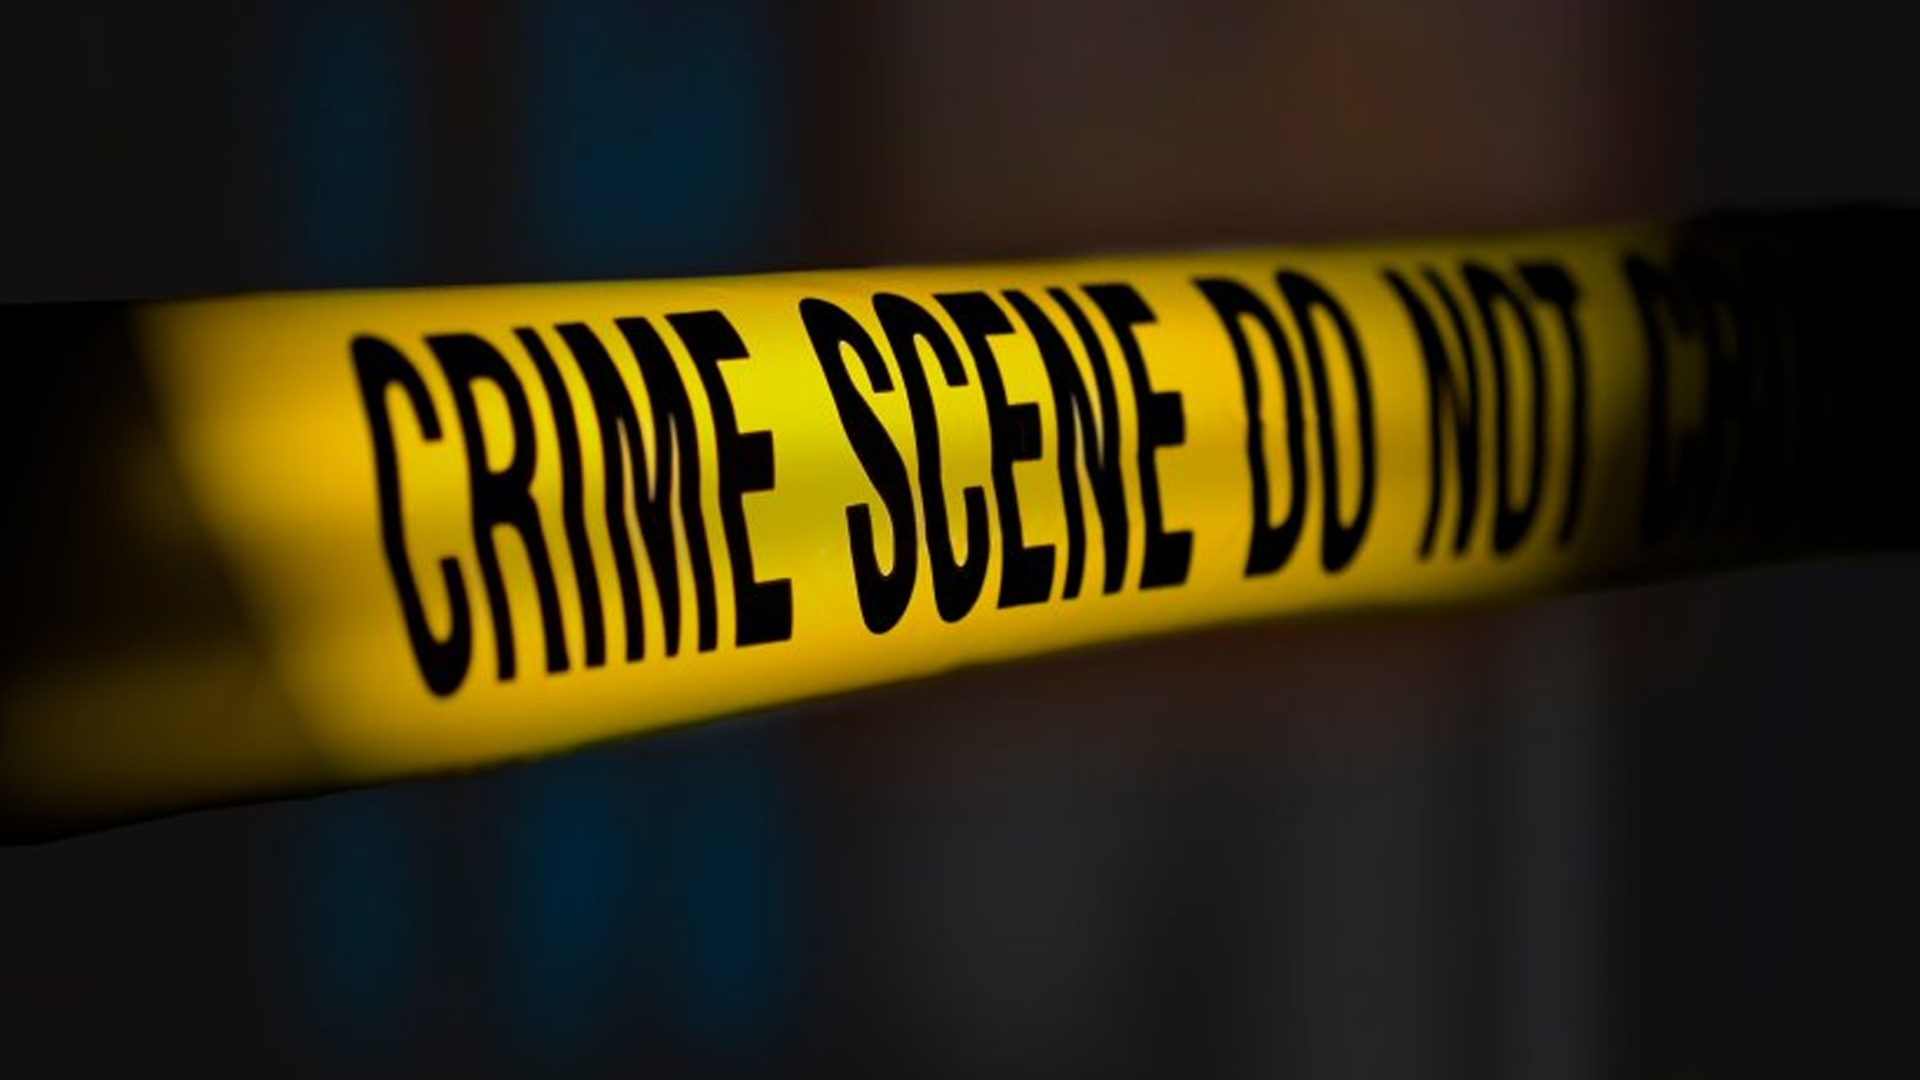 File: Crime Scene-HD Widescreen.jpg | Shena Olsen - Crime Scene PNG HD